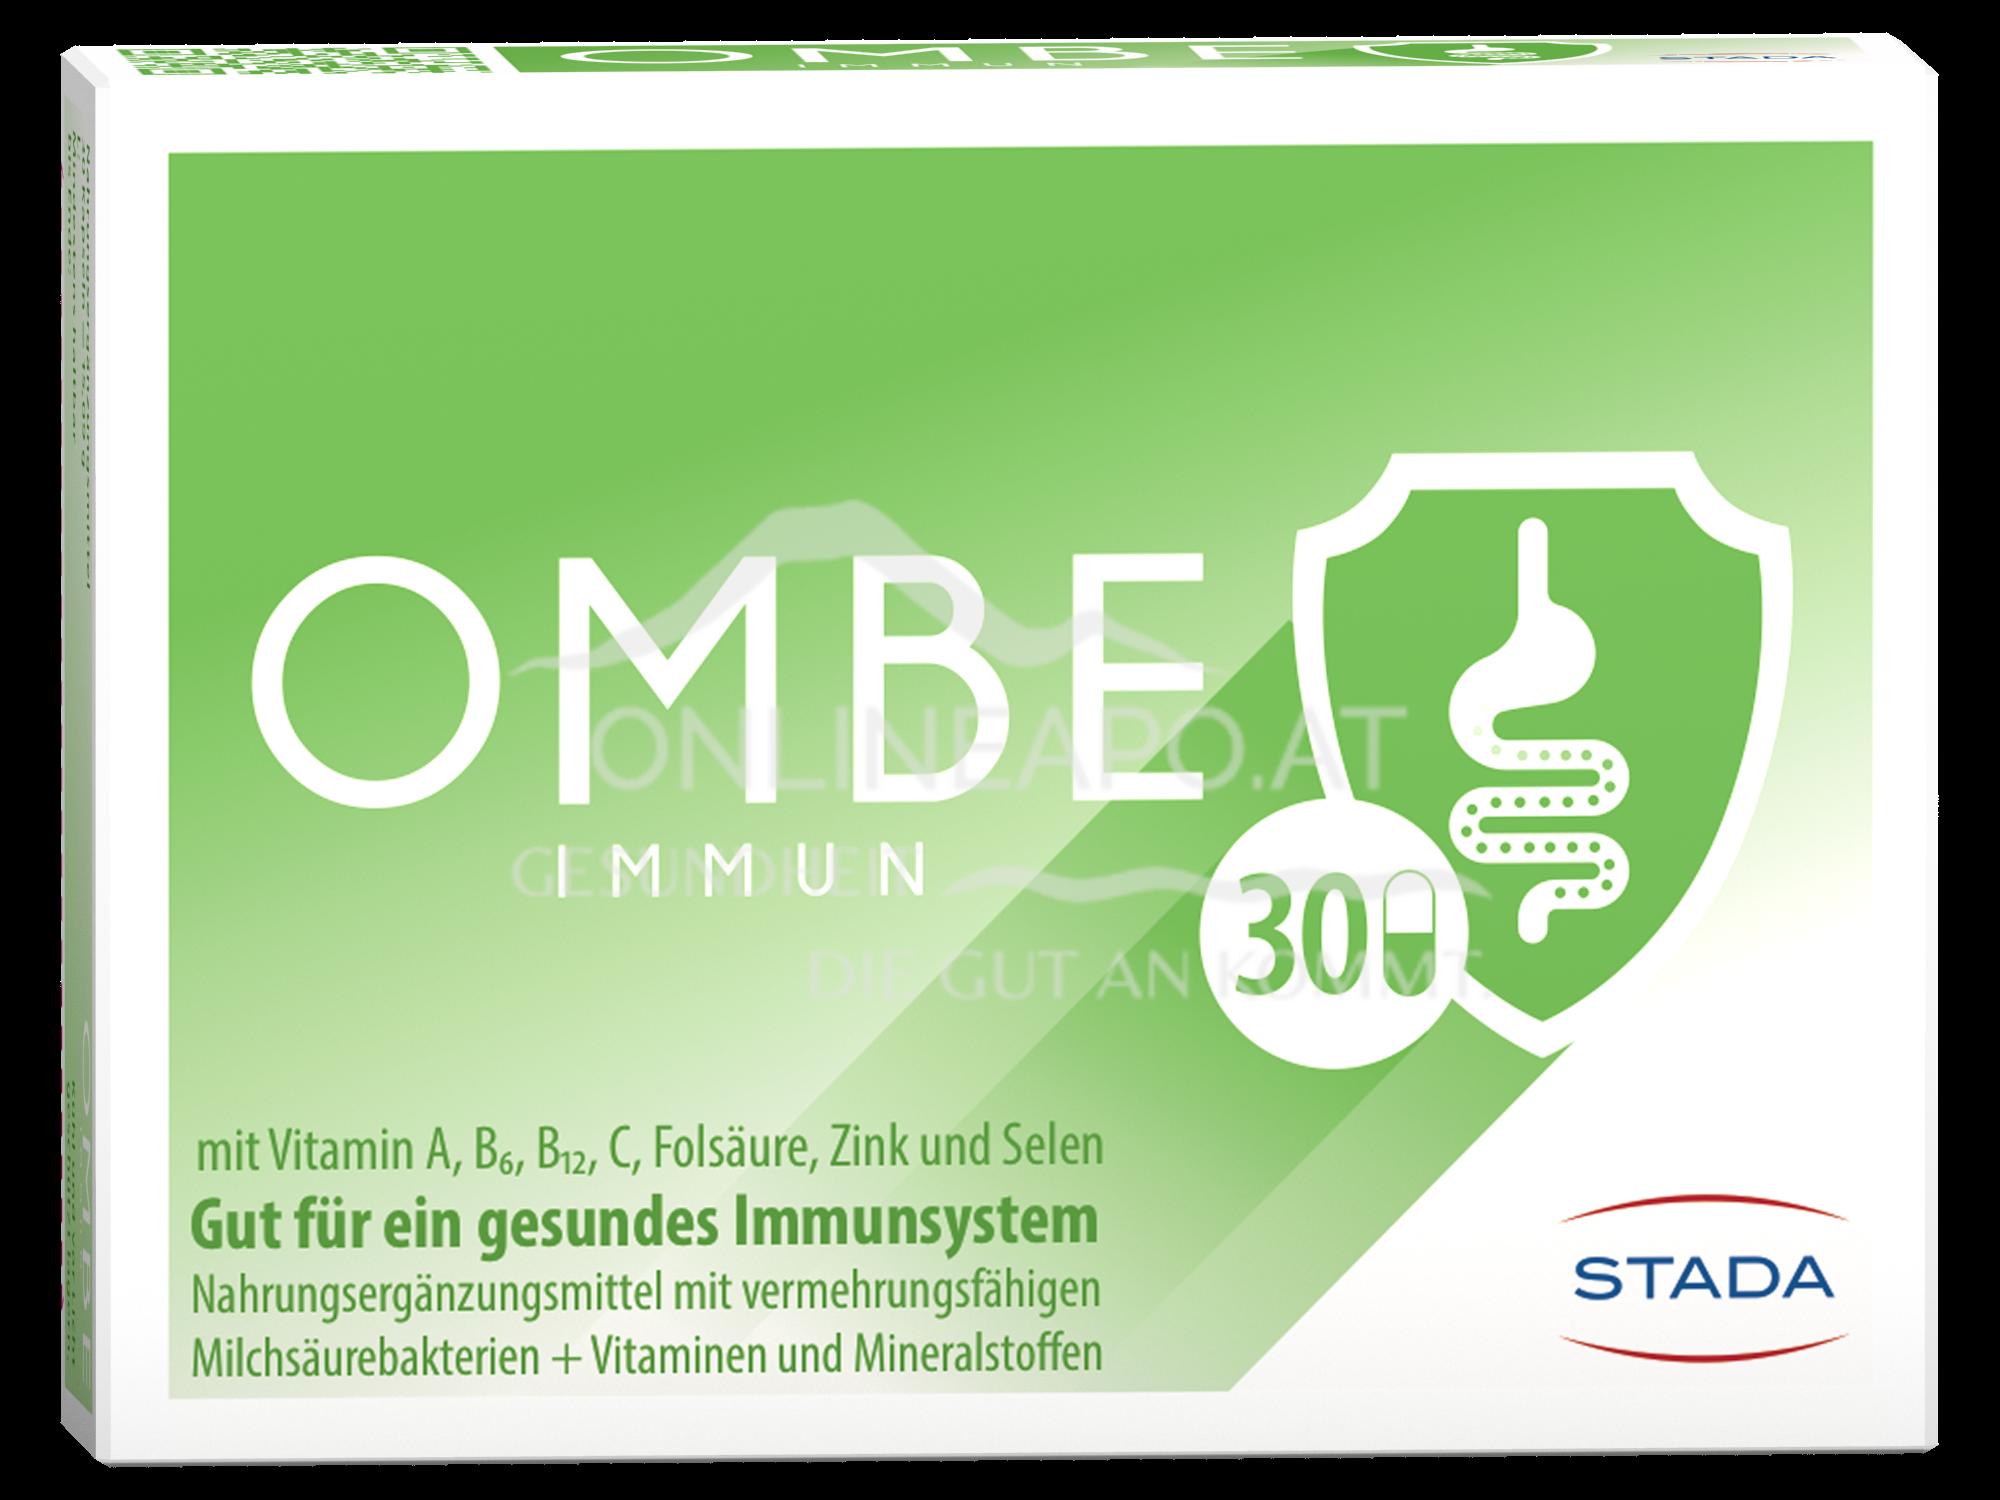 OMBE Immun